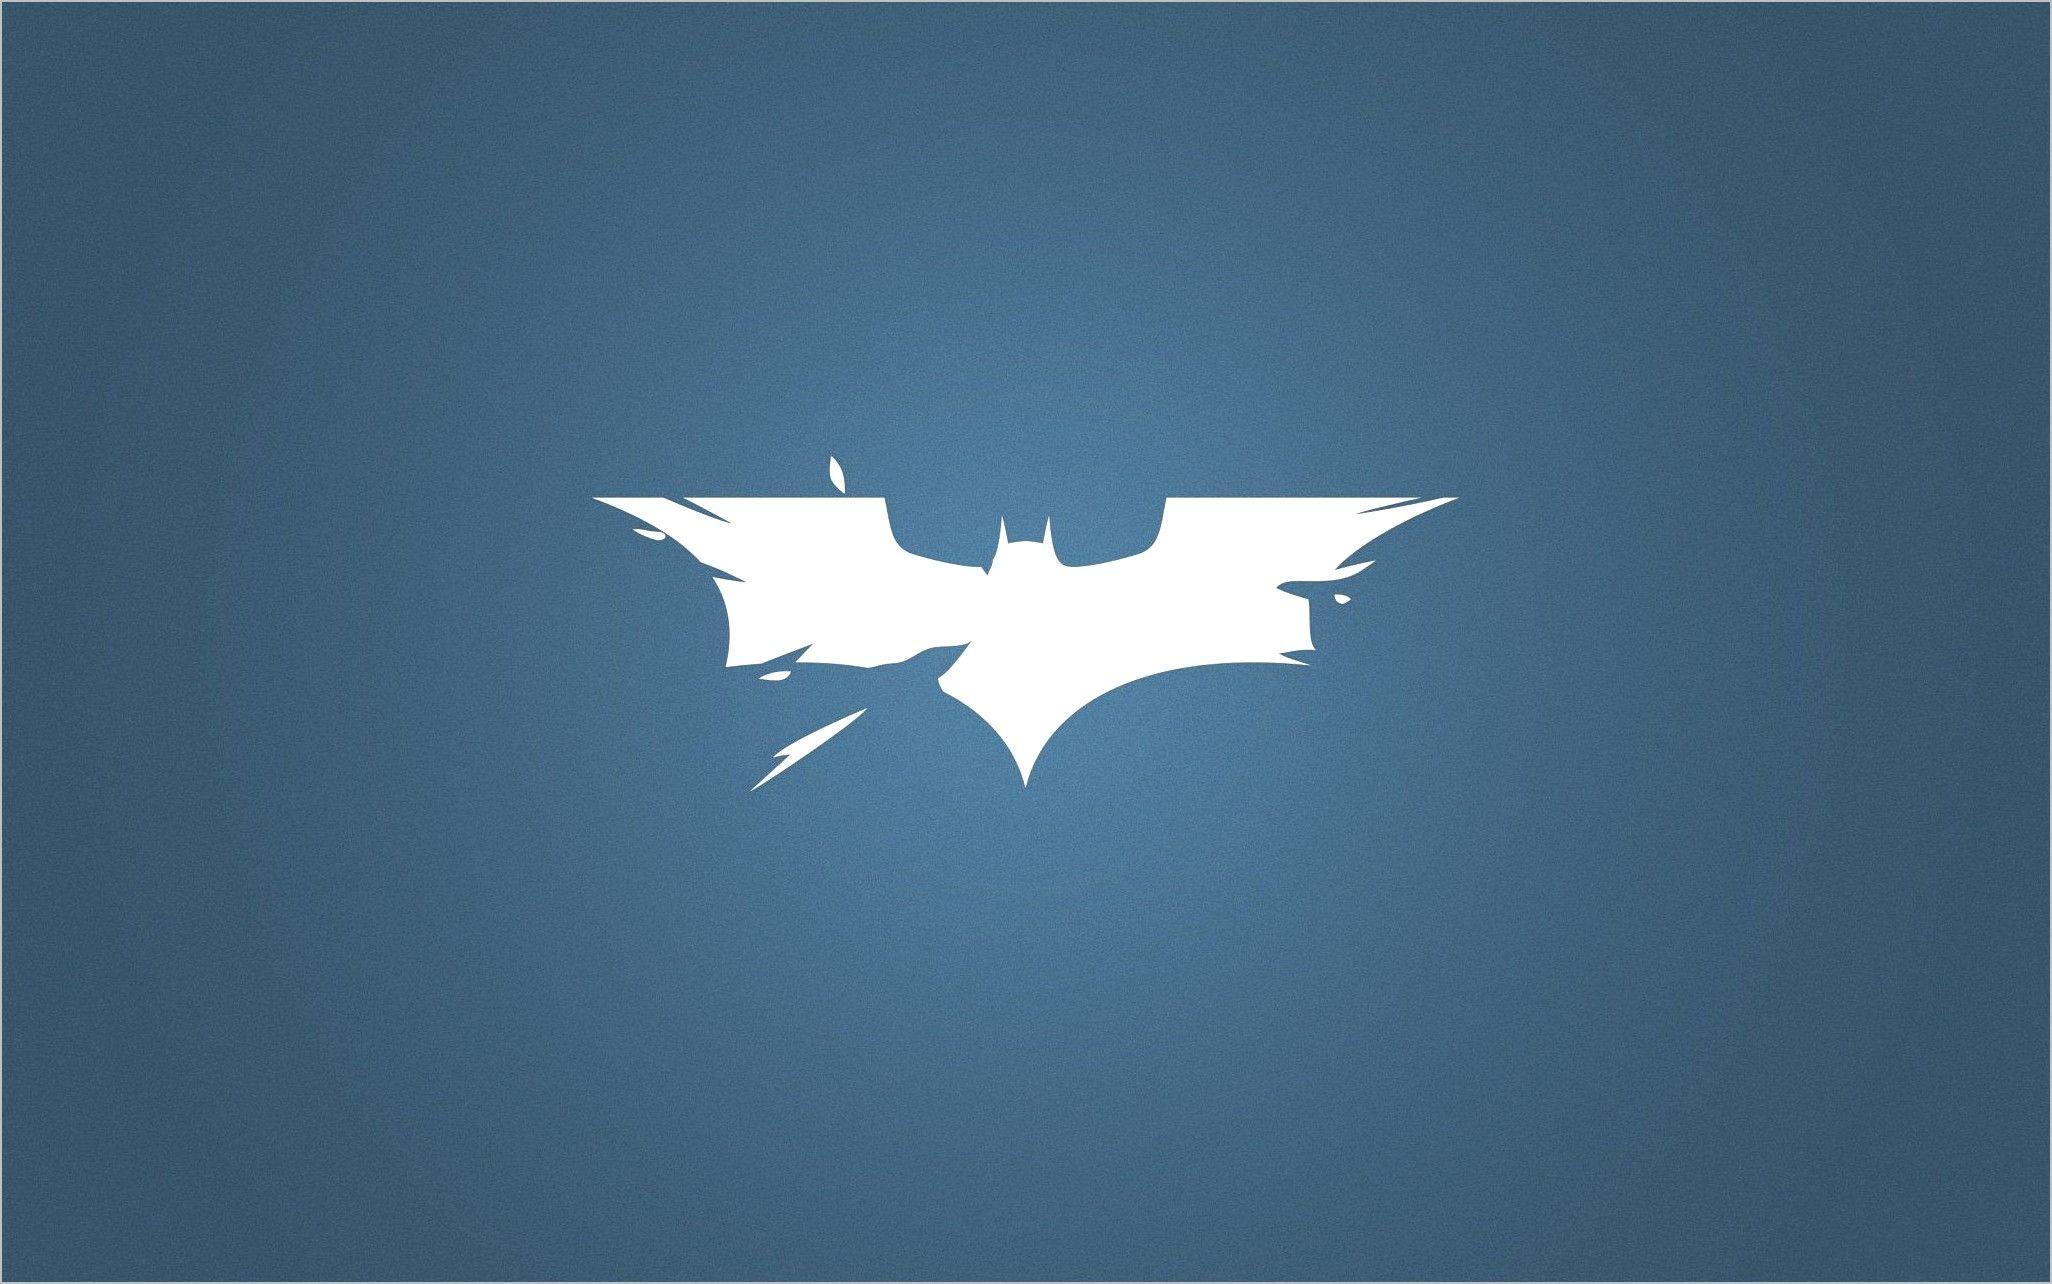 Batman Wallpaper 4k Logo In 2020 Batman Wallpaper 4k Wallpaper For Mobile Minimalist Wallpaper